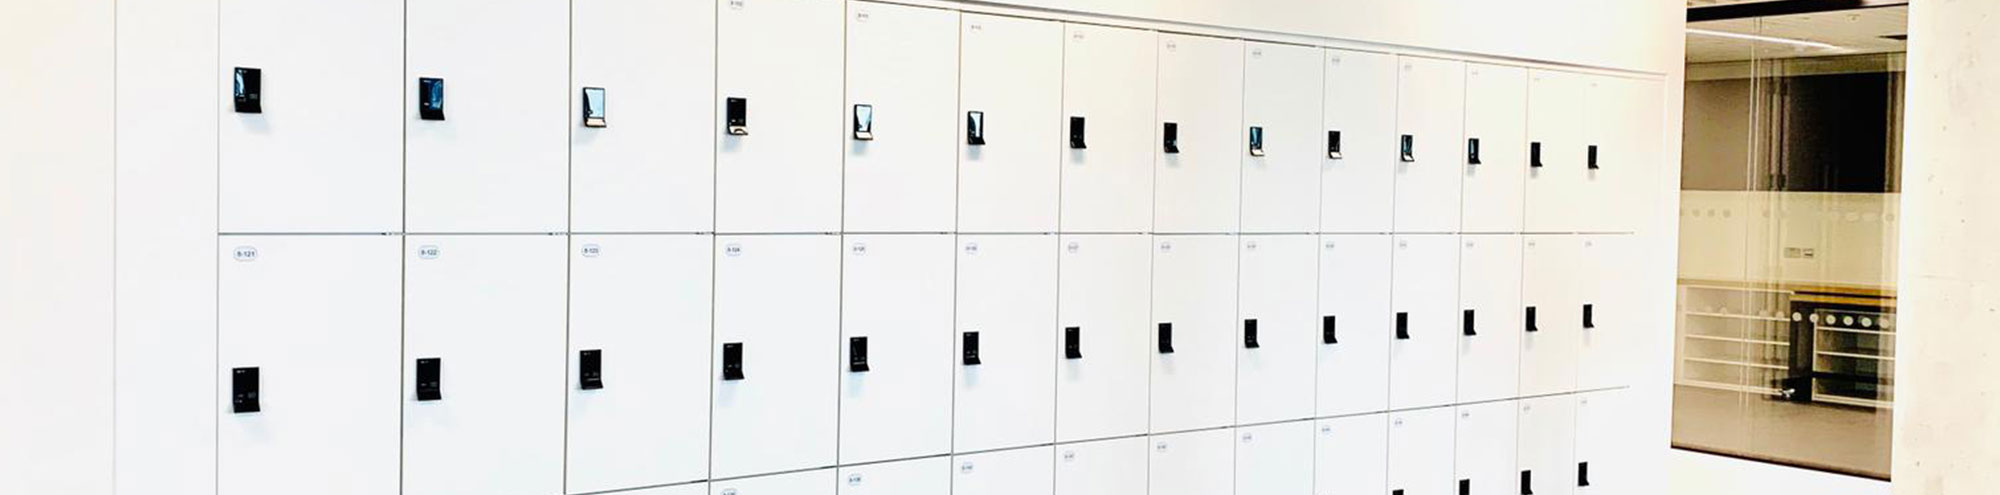 RFID Lockers For Major British Publisher